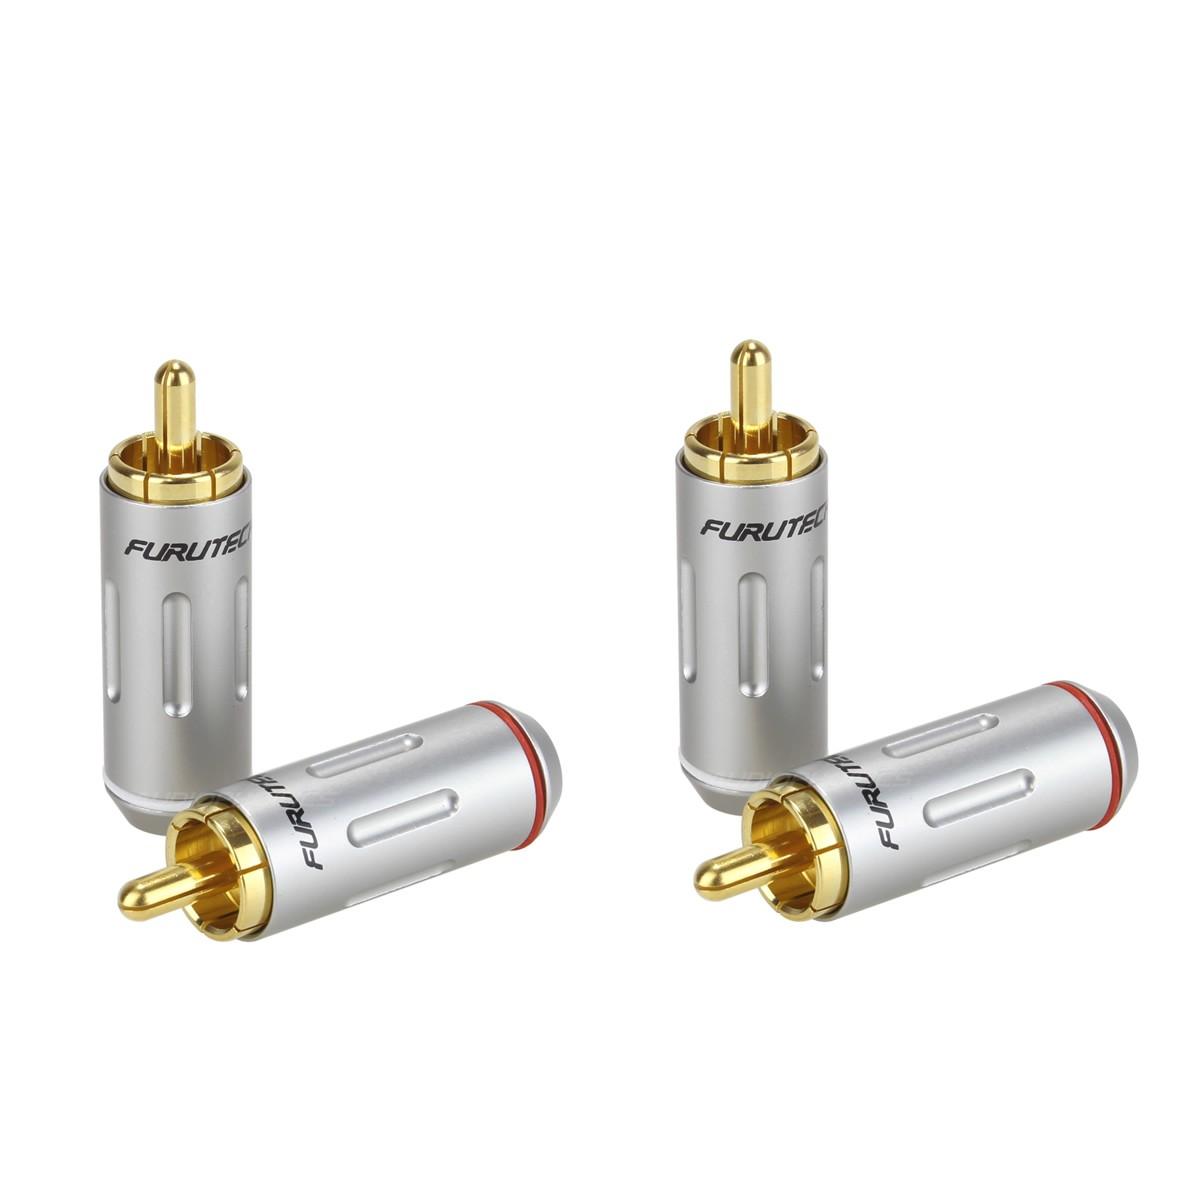 FURUTECH FP-162 (G) Gold-Plated RCA Connectors 24k Ø7.2mm (Set x4)